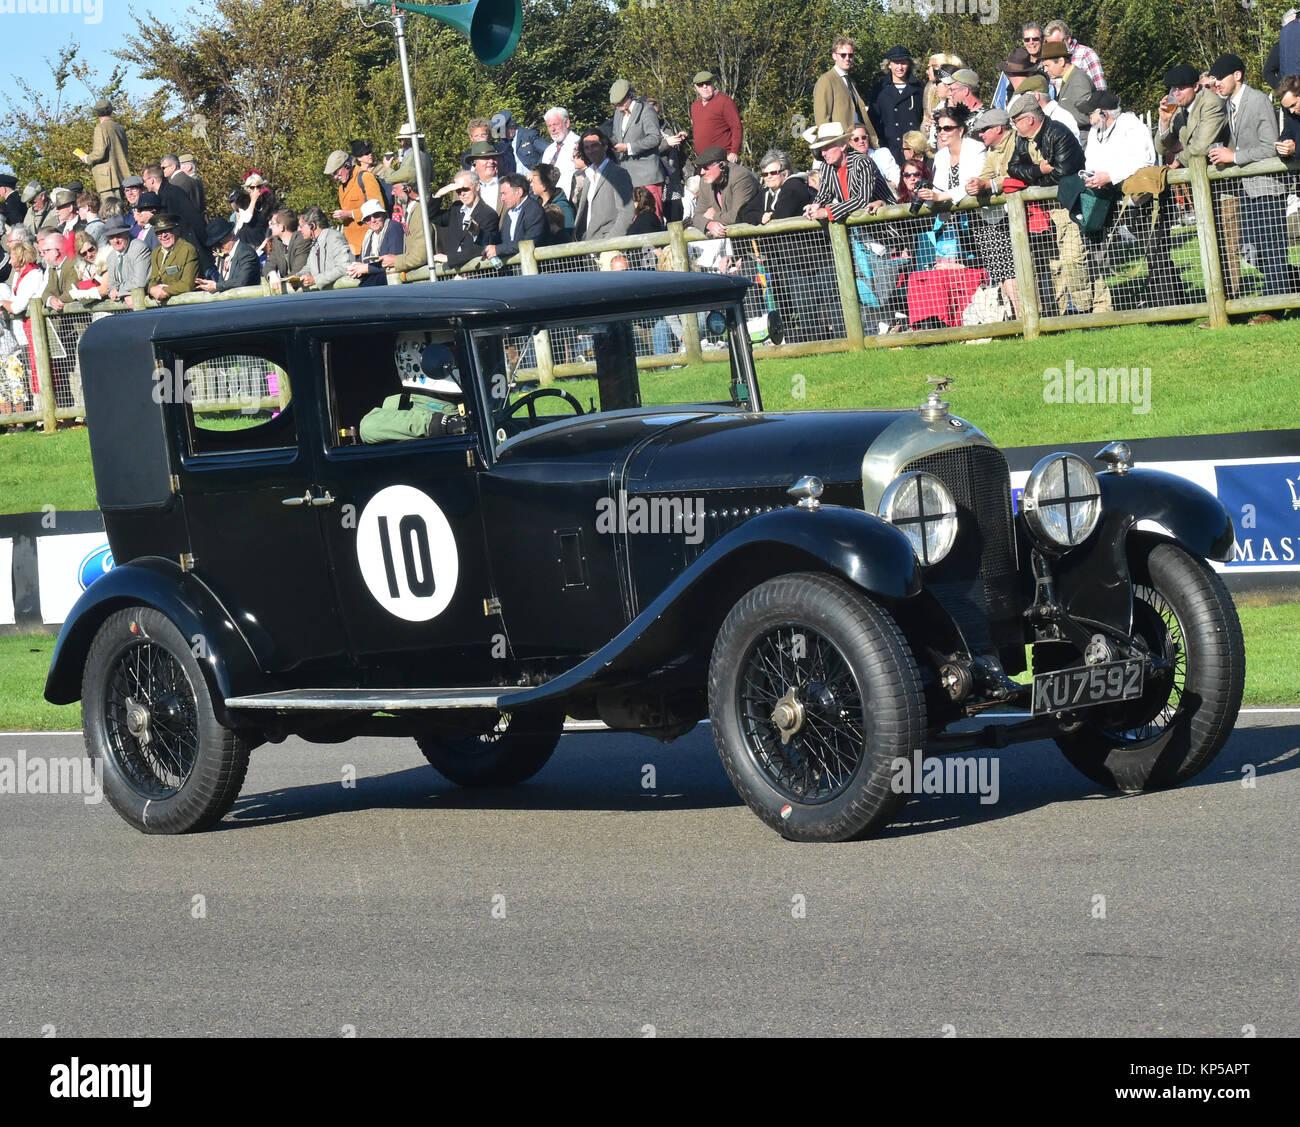 Classic 1936 Bentley 4 Derby Sports Saloon Sedan Saloon: Bentley Saloon Stock Photos & Bentley Saloon Stock Images